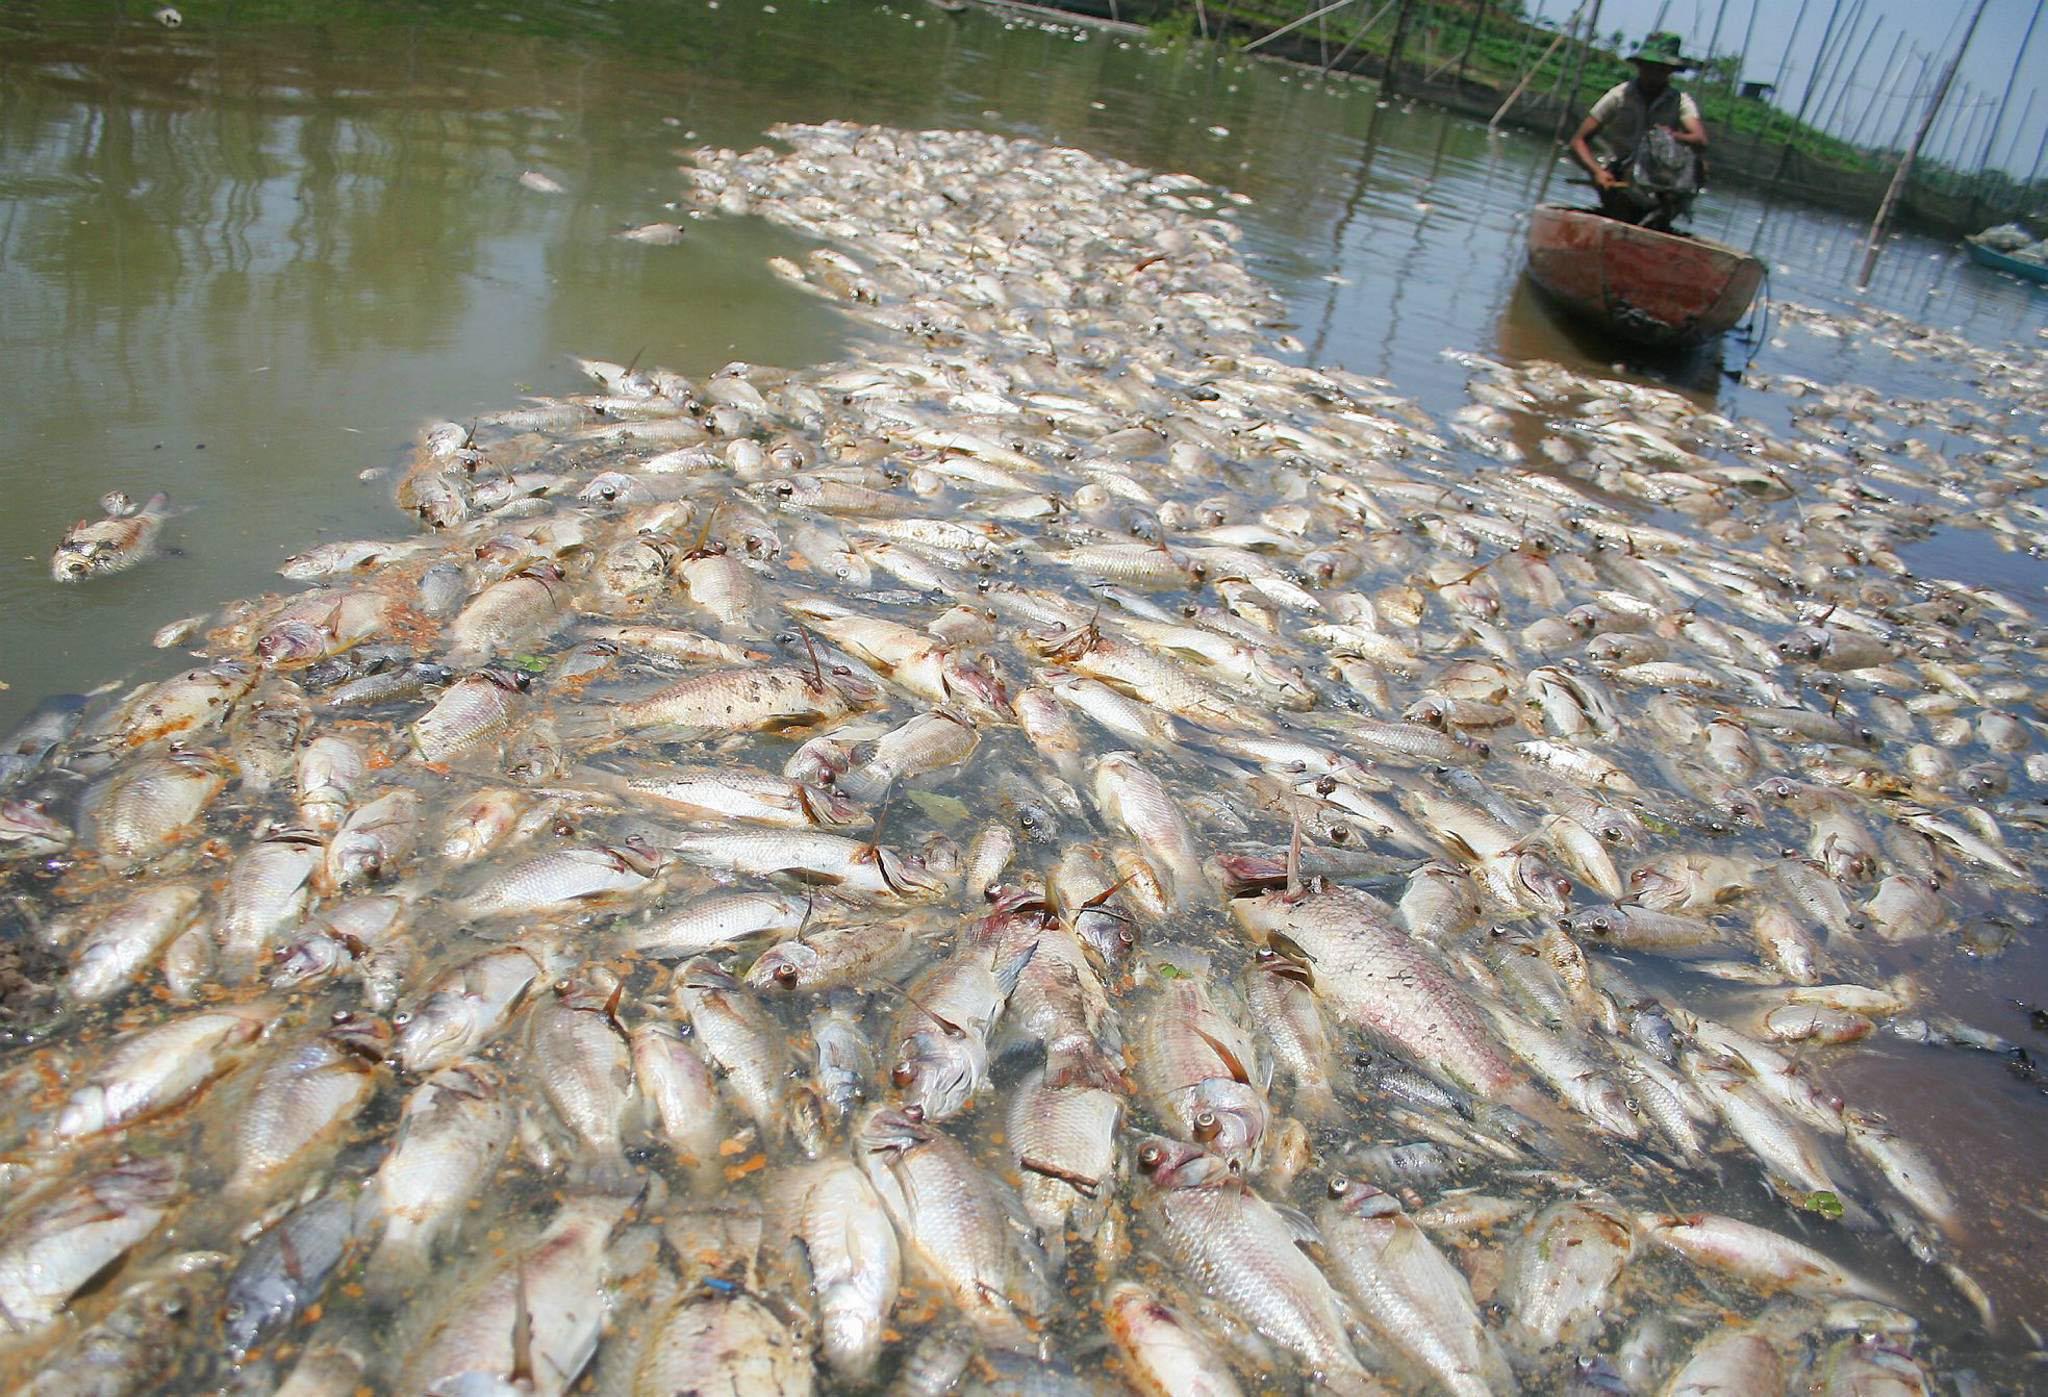 Macam Macam Tanaman Lumut Budidaya Tanaman Pembibitan Perawatan Pengaruh Pencemaran Air Terhadap Kehidupan Akuatik Goeners